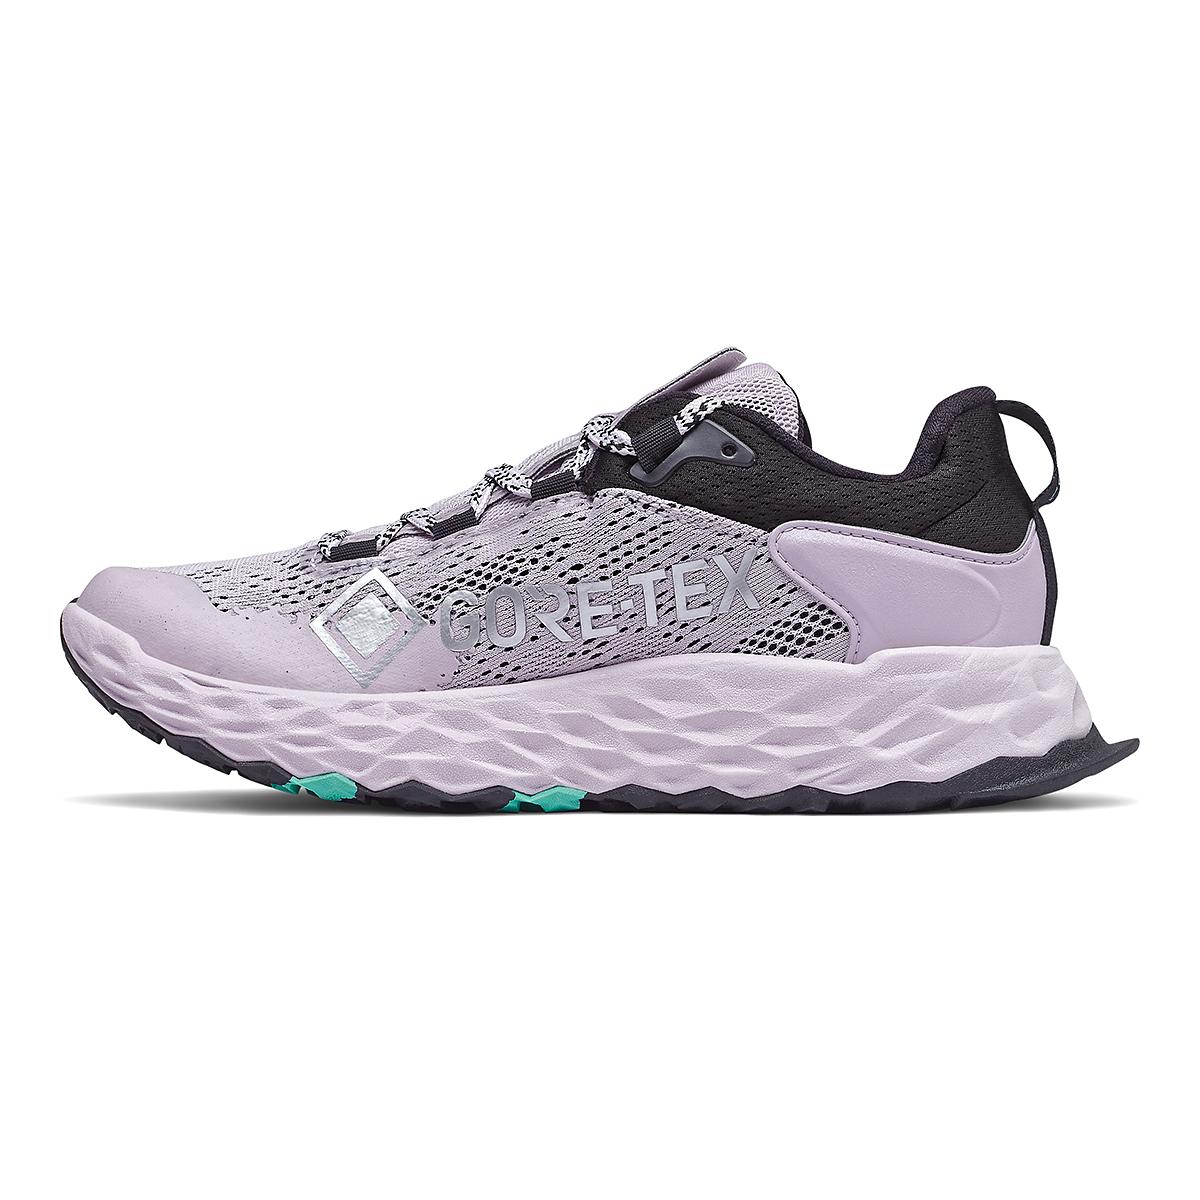 Women's New Balance Hierro V5 Gore-Tex Running Shoe - Color: Mystic Purple - Size: 6 - Width: Regular, Mystic Purple, large, image 2